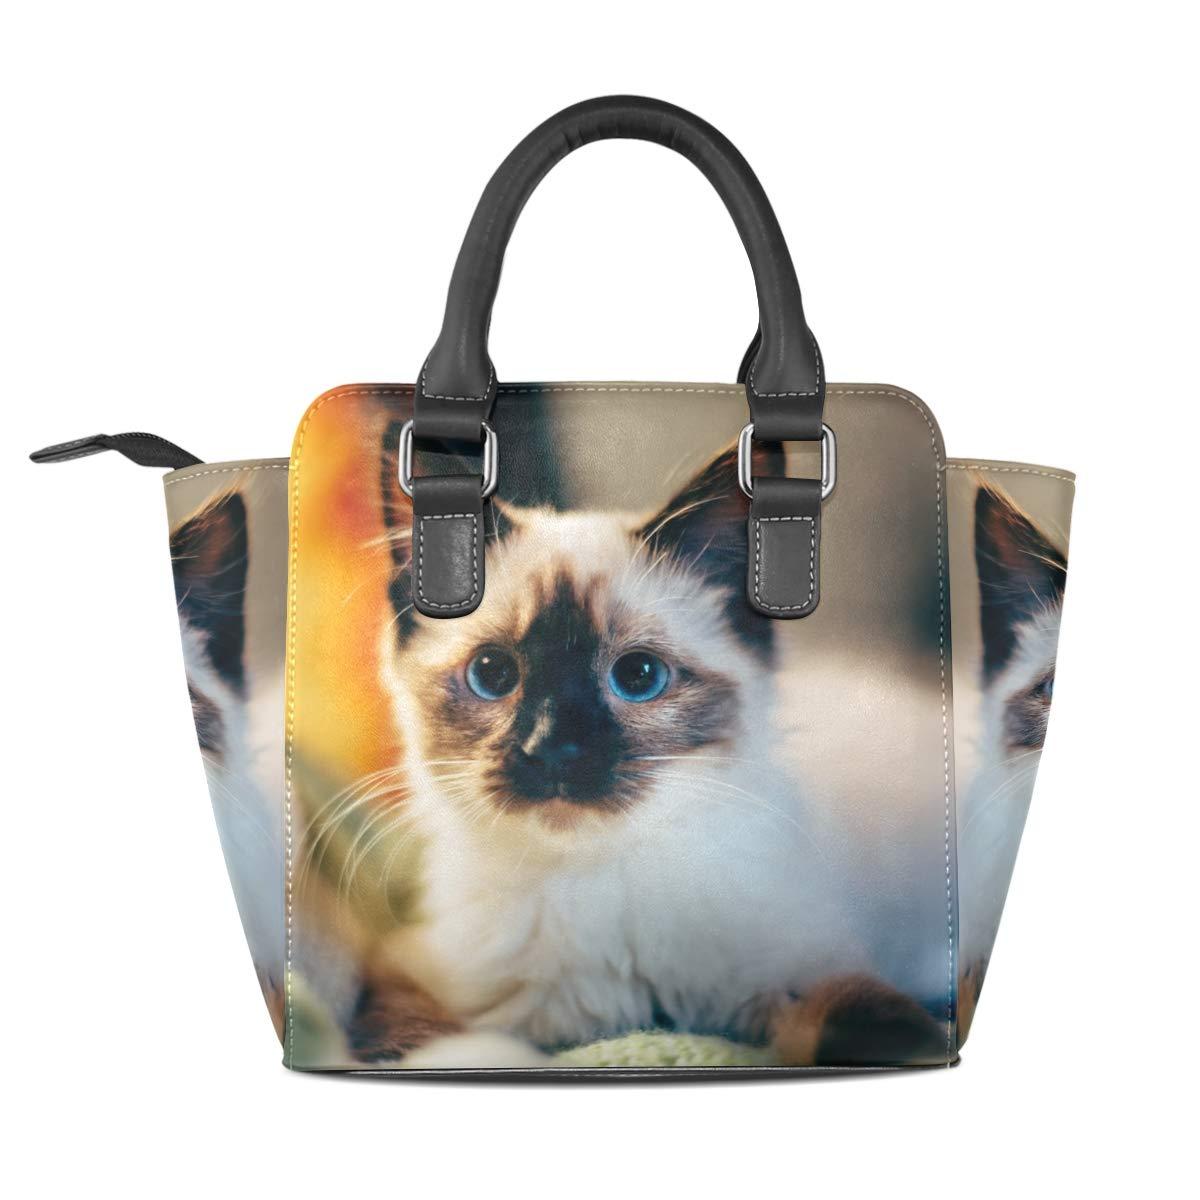 ac5d0cf051ab Amazon.com: Cat Plush Ragdoll Genuine Leather Handbags Purses ...